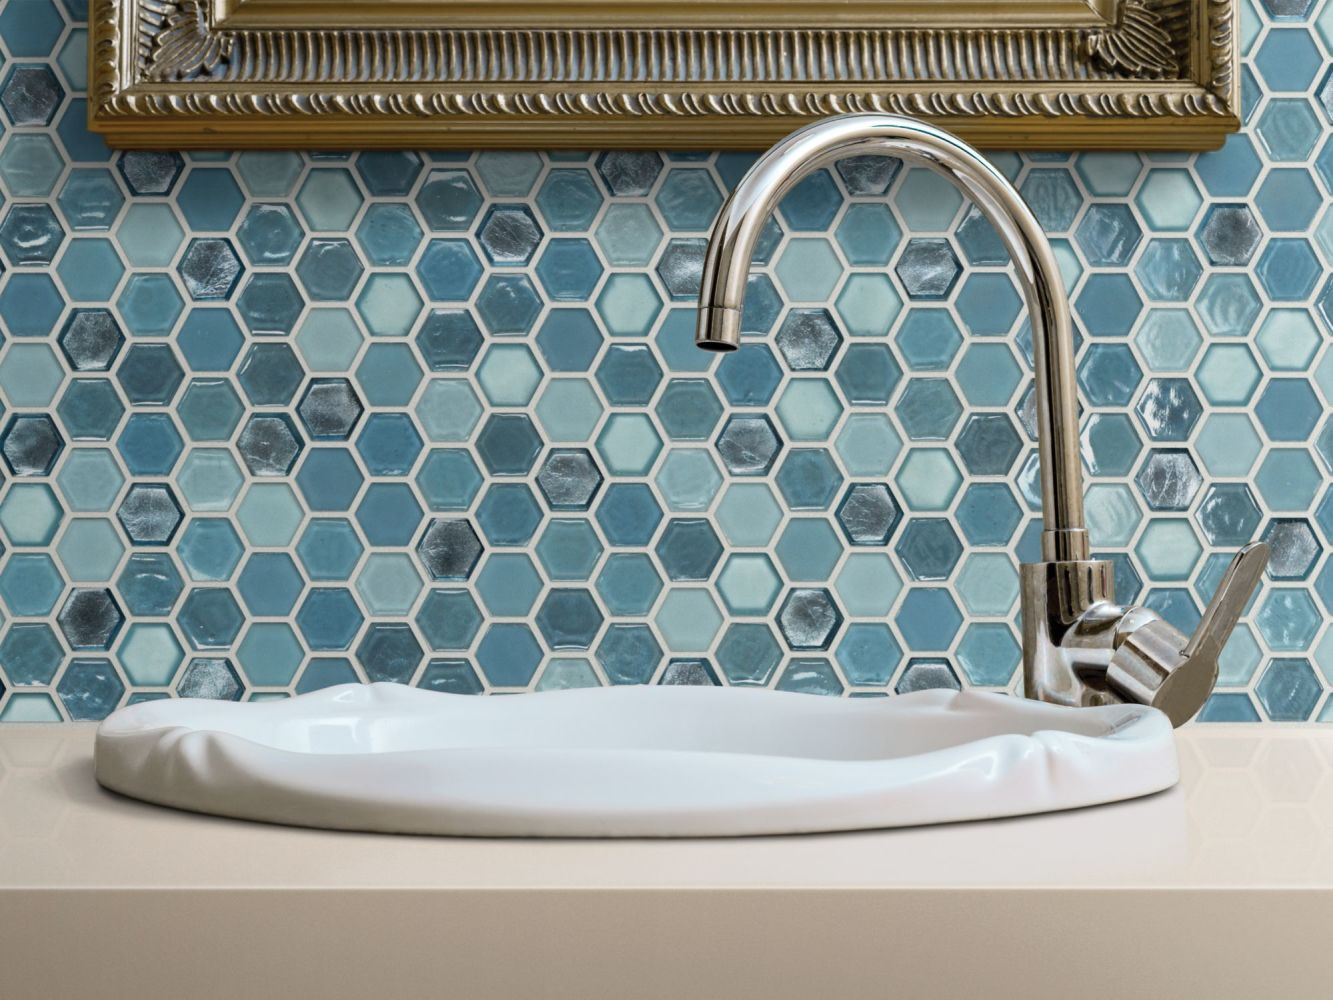 Shaw Floors Home Fn Gold Ceramic Molten Hexagon Glass Santorini 00400_TGJ82